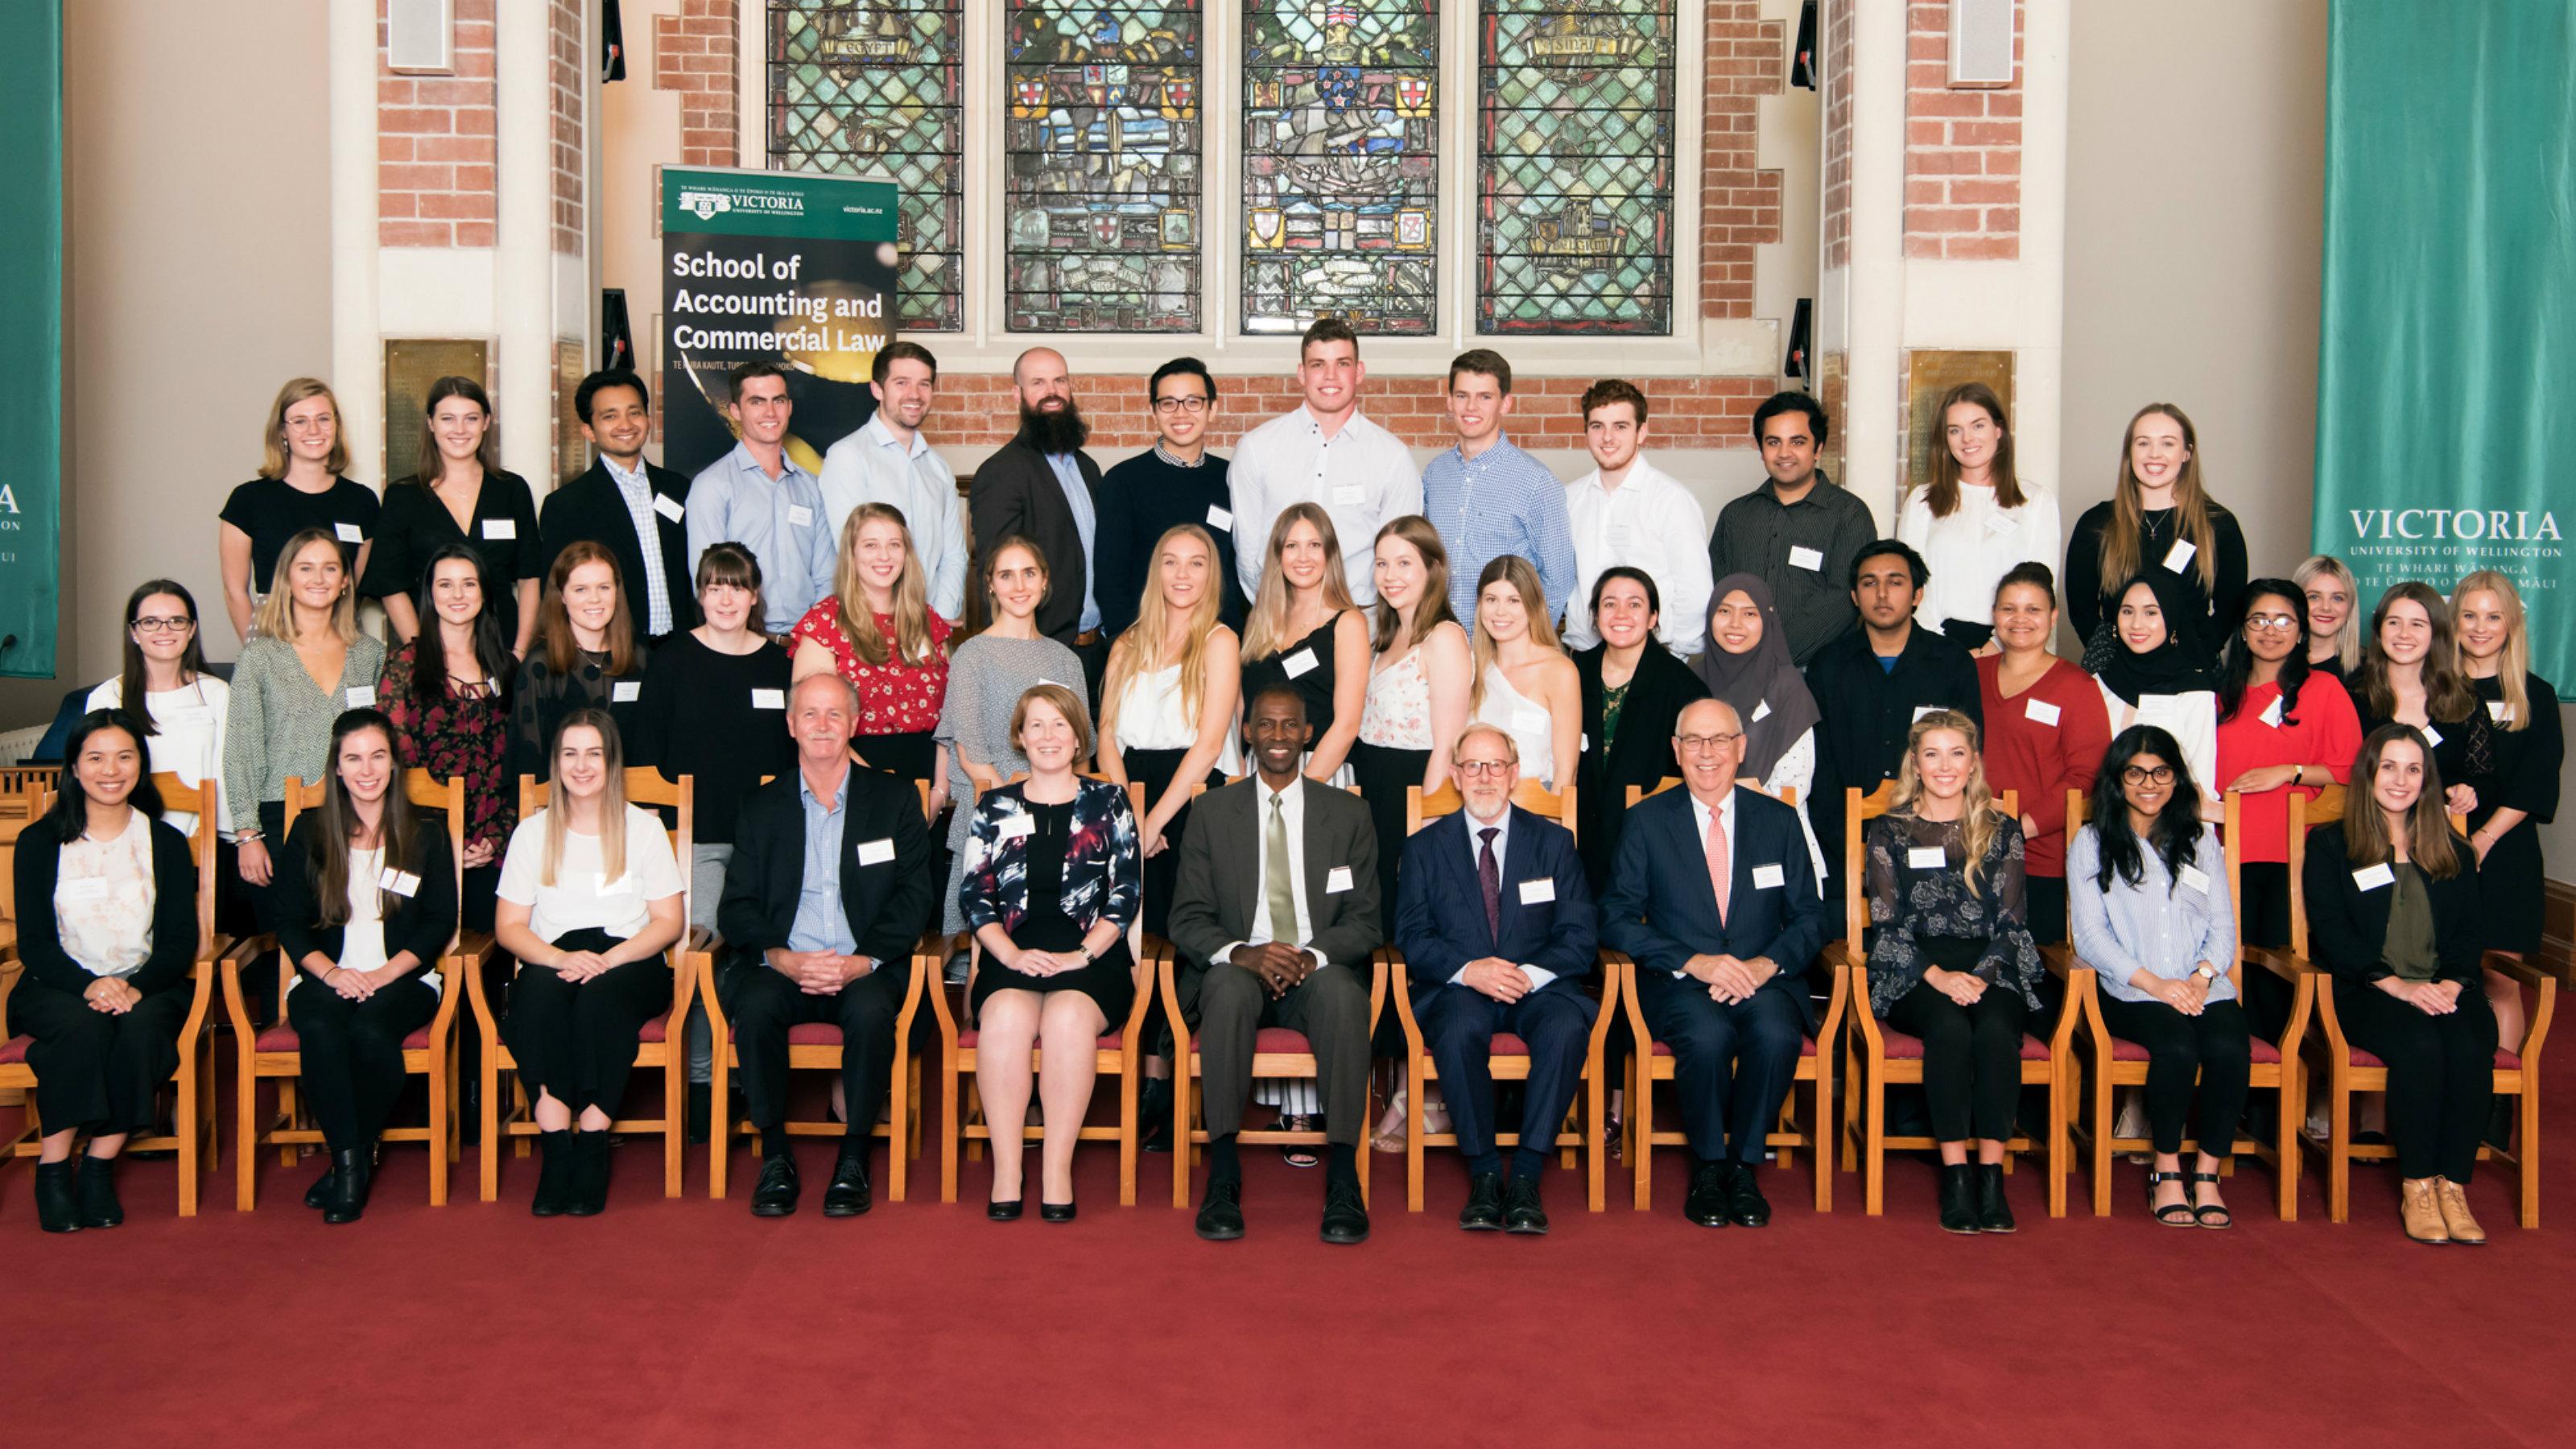 tudent prize-winners, sponsor representatives, and academics